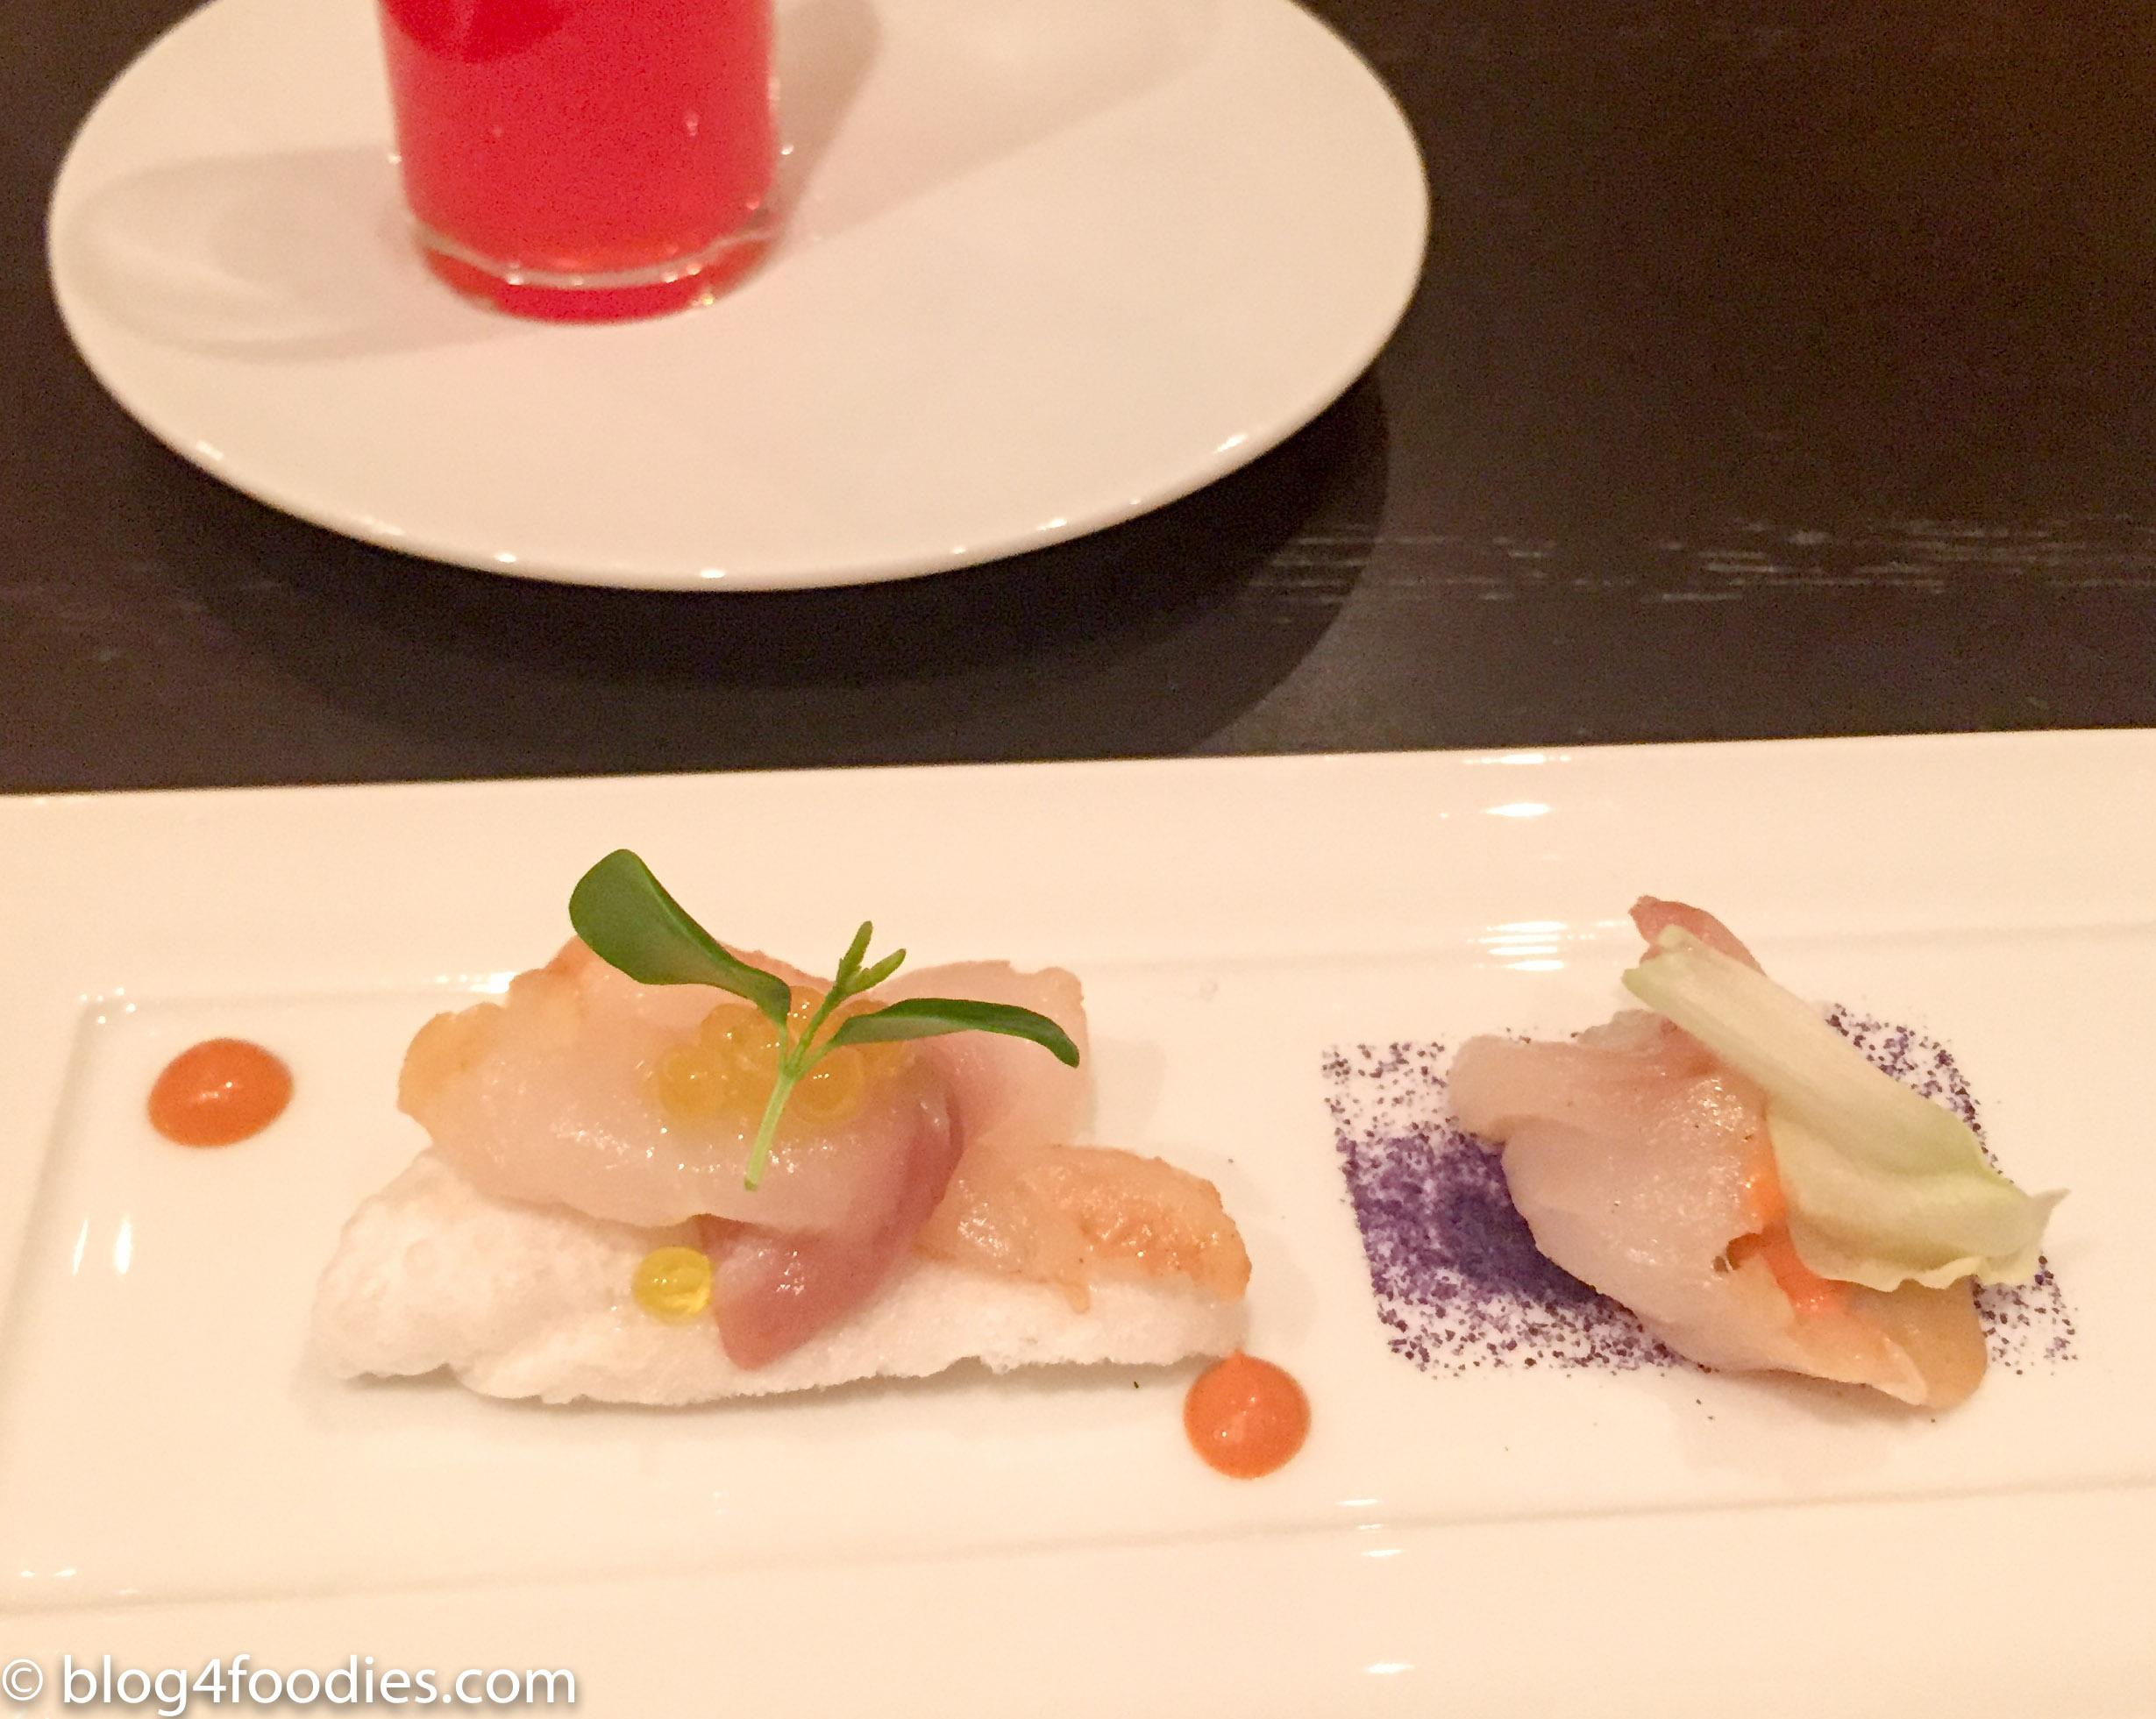 Alpenroyal gourmet restaurant val gardena italy blog4foodies - Amuse gueule italien ...